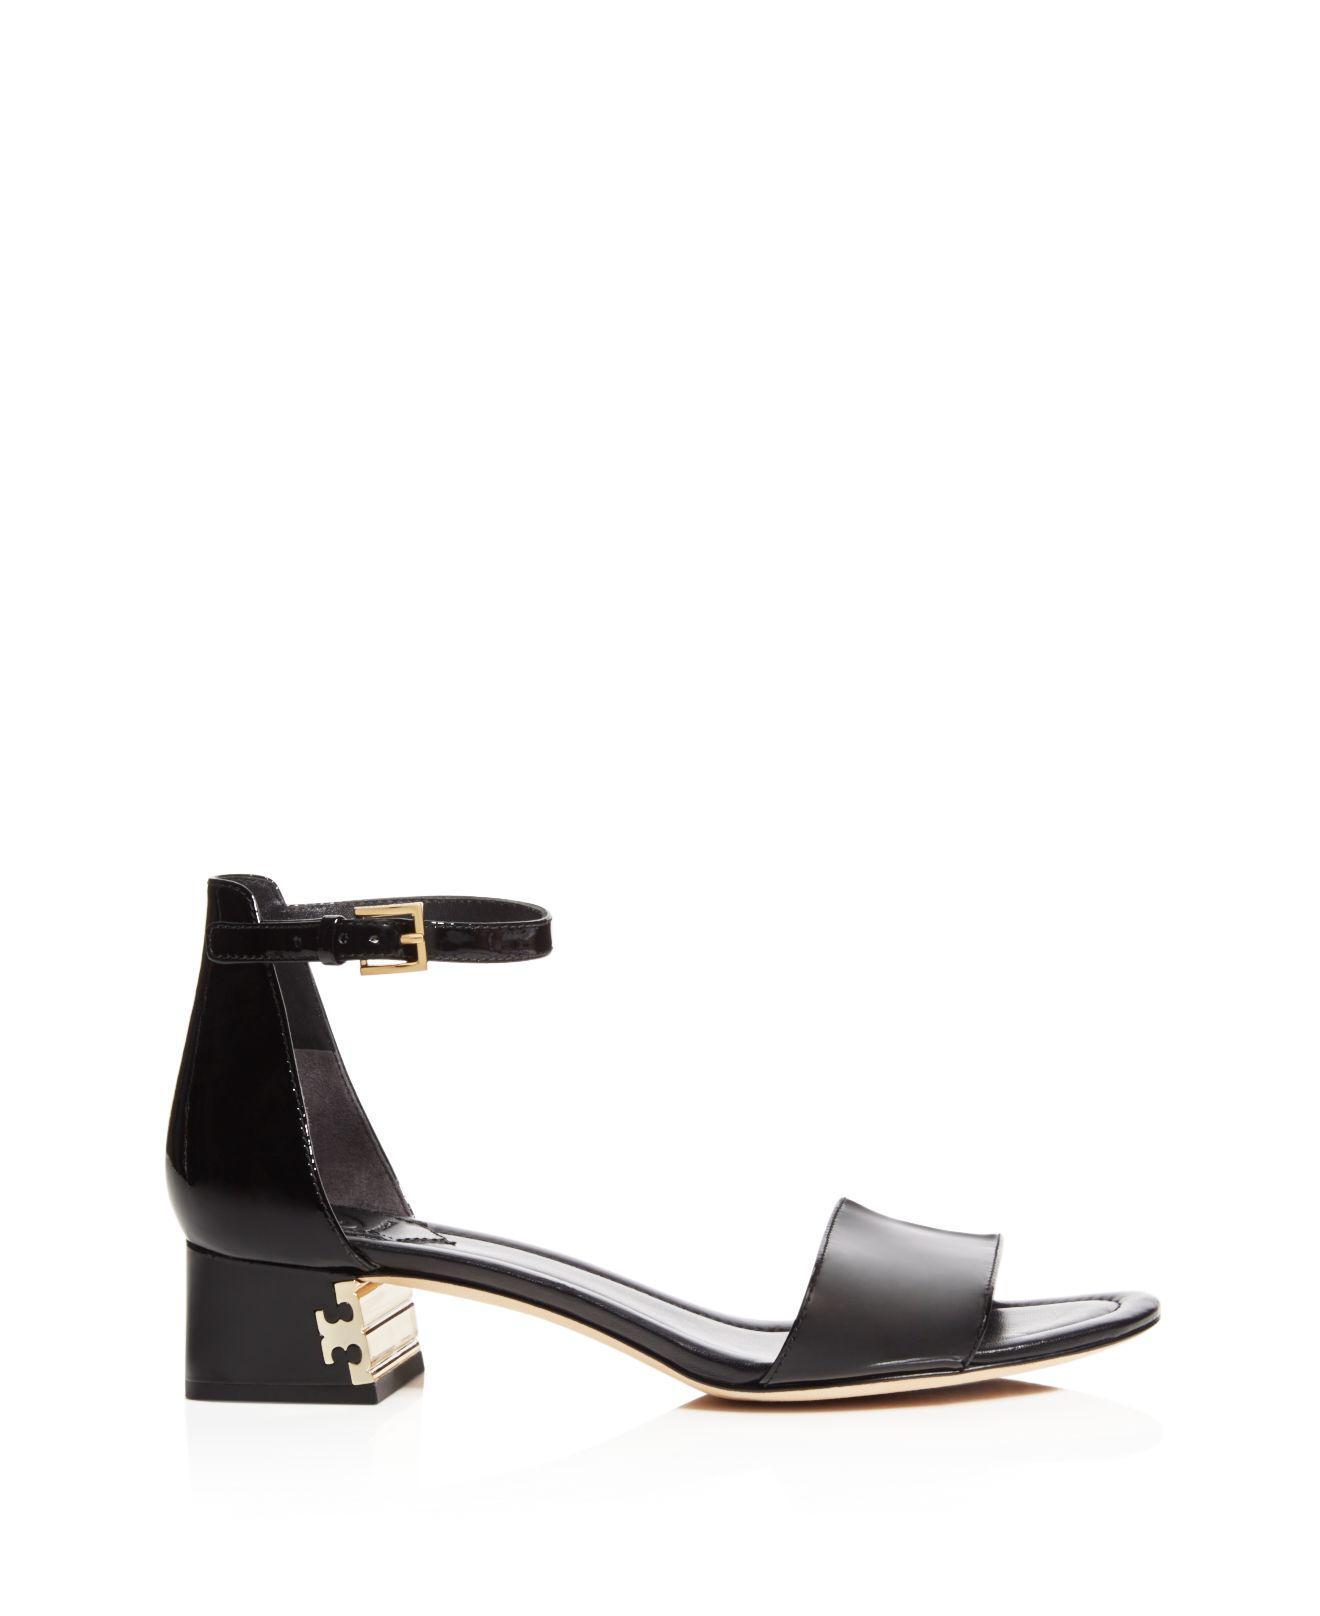 4335ec137fd0 Lyst - Tory Burch Finley Patent Leather Logo Block Heel Sandals in Black